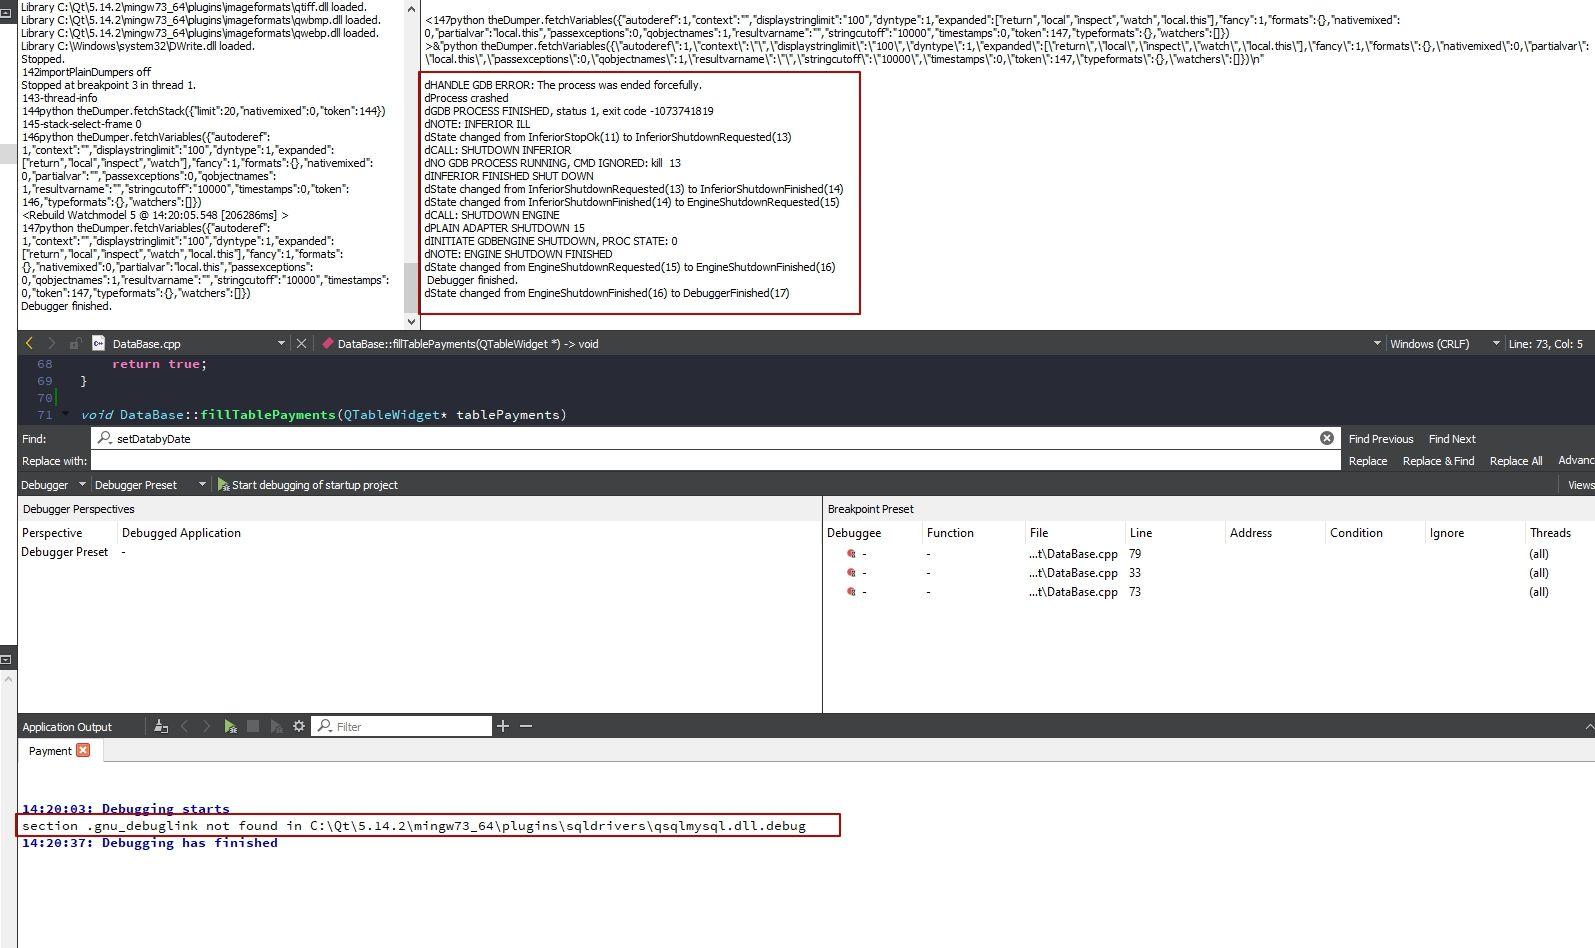 gdb errors.jpg